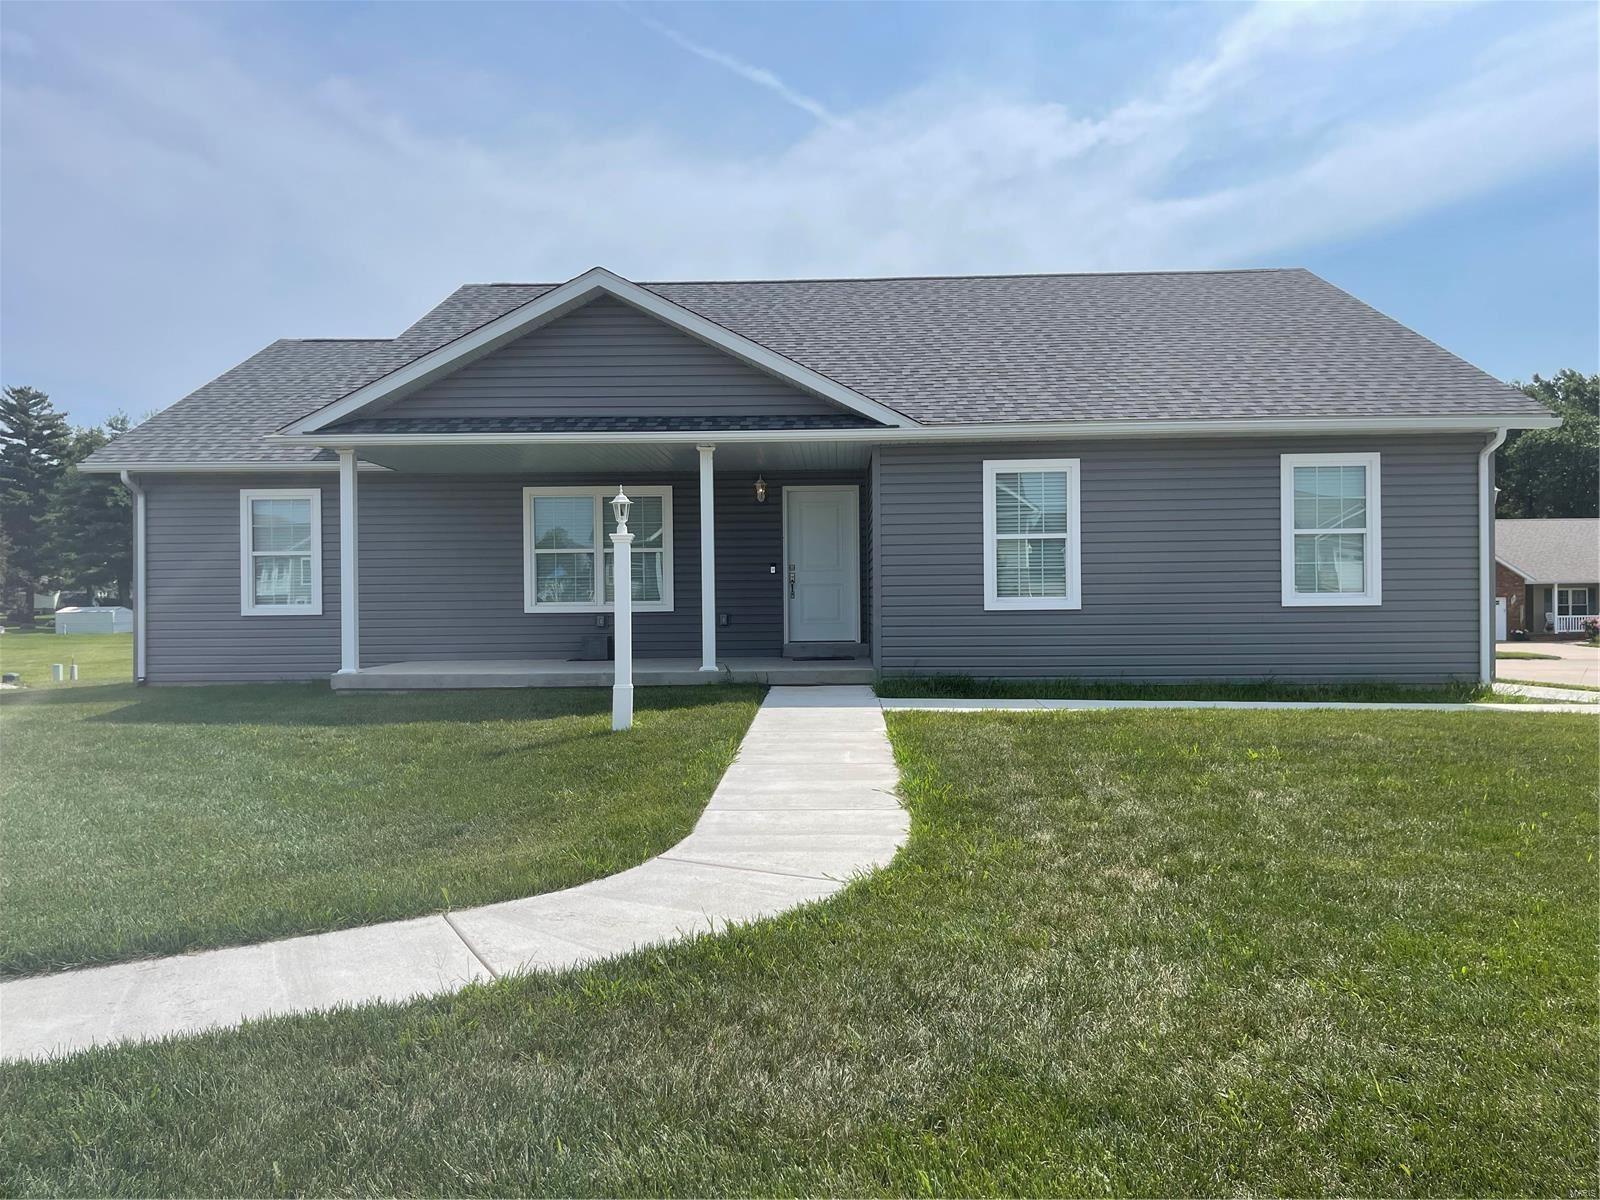 5 Christopher Court, Jerseyville, IL 62052 - MLS#: 21058505